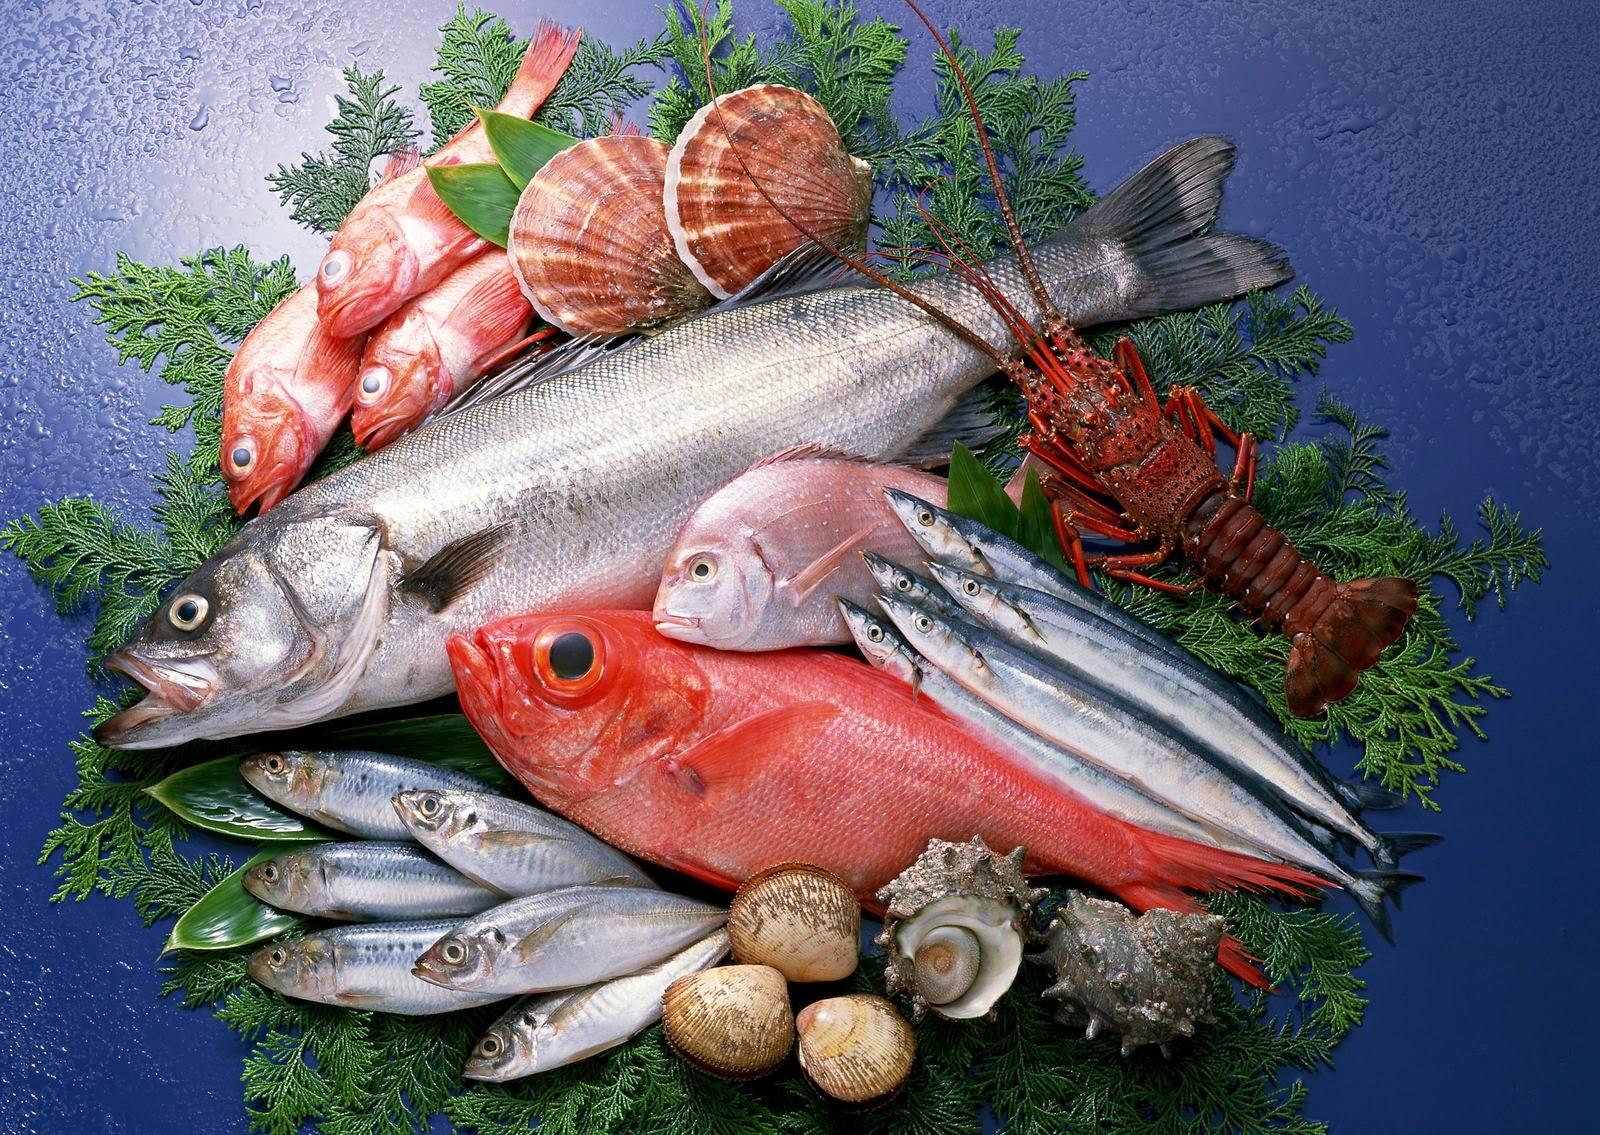 http://www.huffingtonpost.com/2015/02/24/fresh-fish-last_n_6735834.html